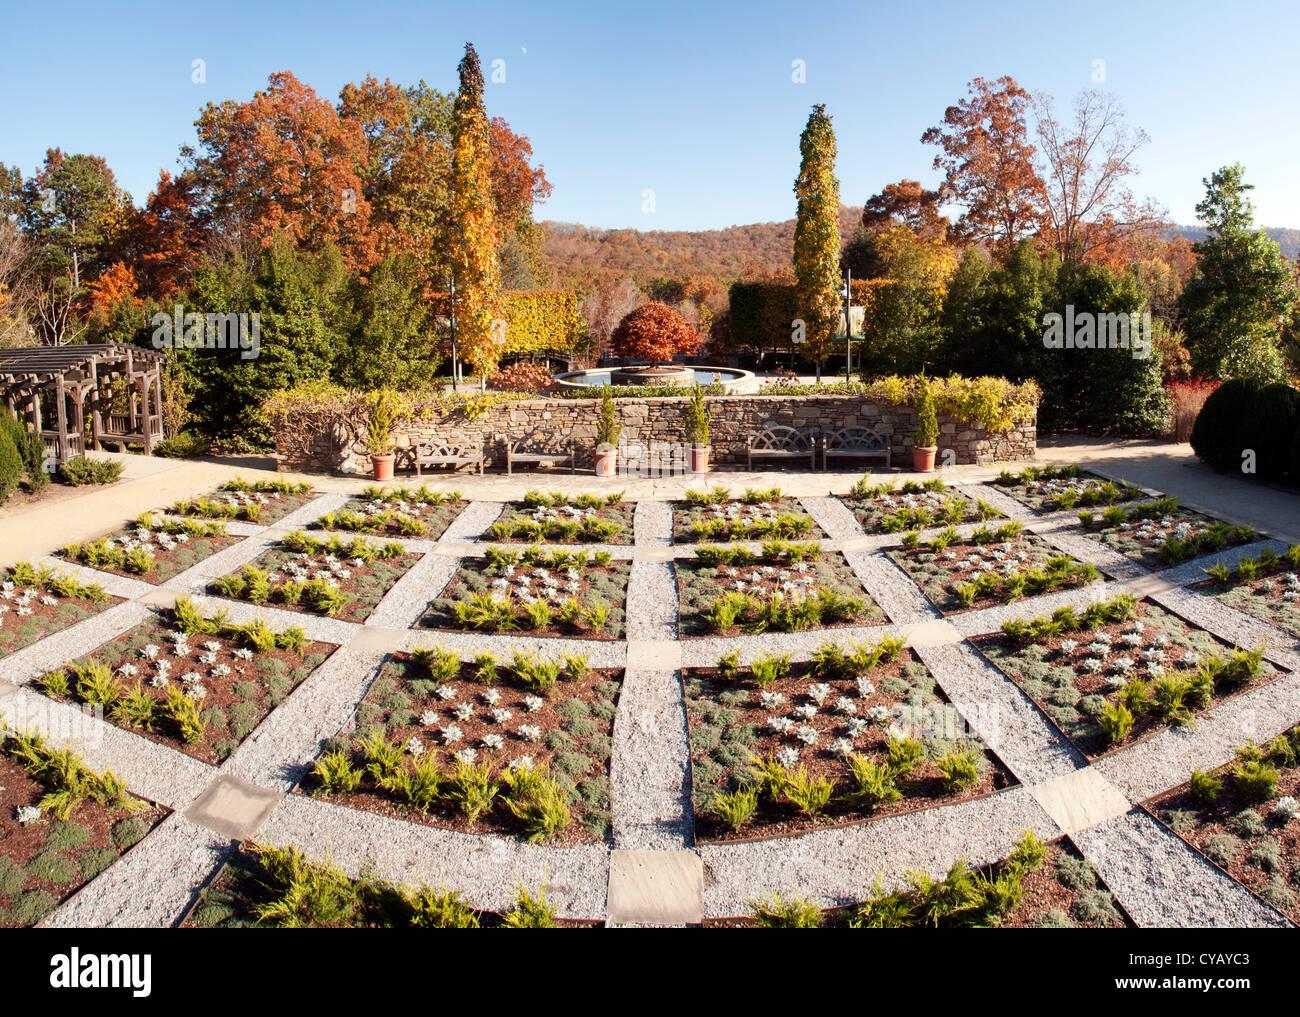 North Carolina Arboretum Quilt Garden (Panoramic Composite Image) - Asheville, North Carolina, USA - Stock Image